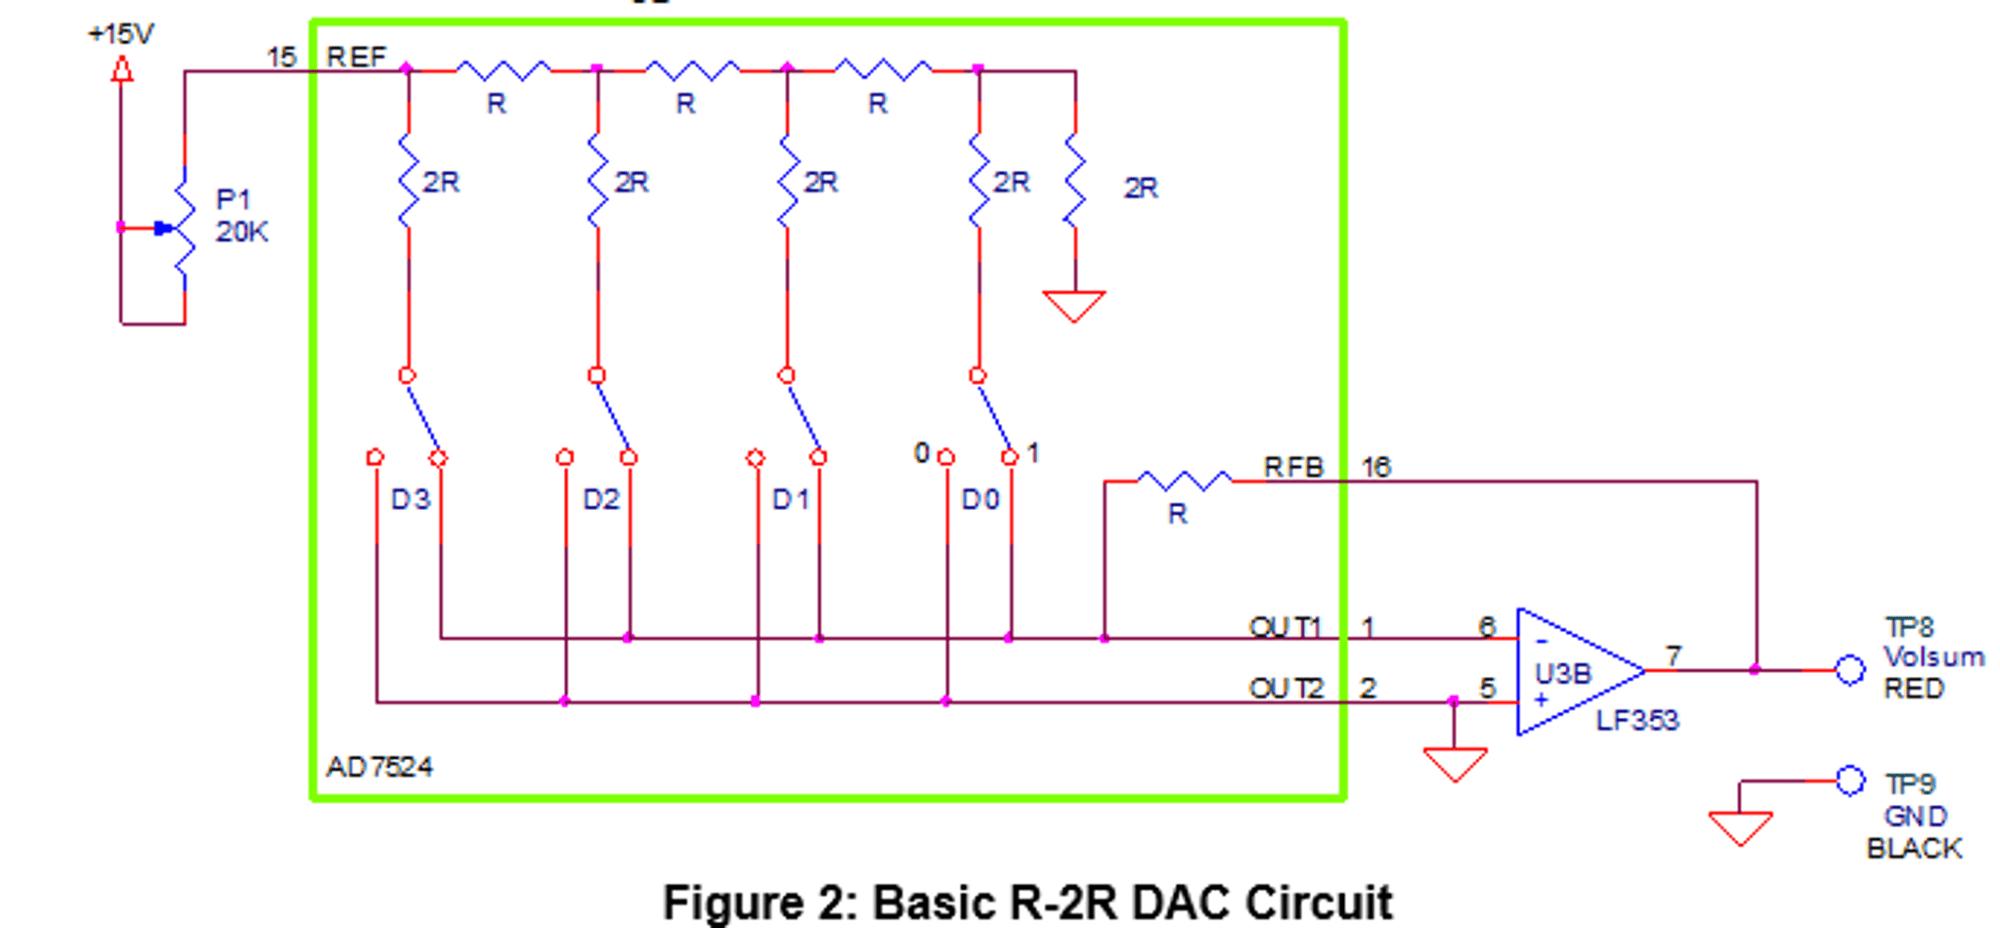 hight resolution of  15v 15 ref 2r 2r 2r 2r p1 20k 0 o rfb 18 d3 d2